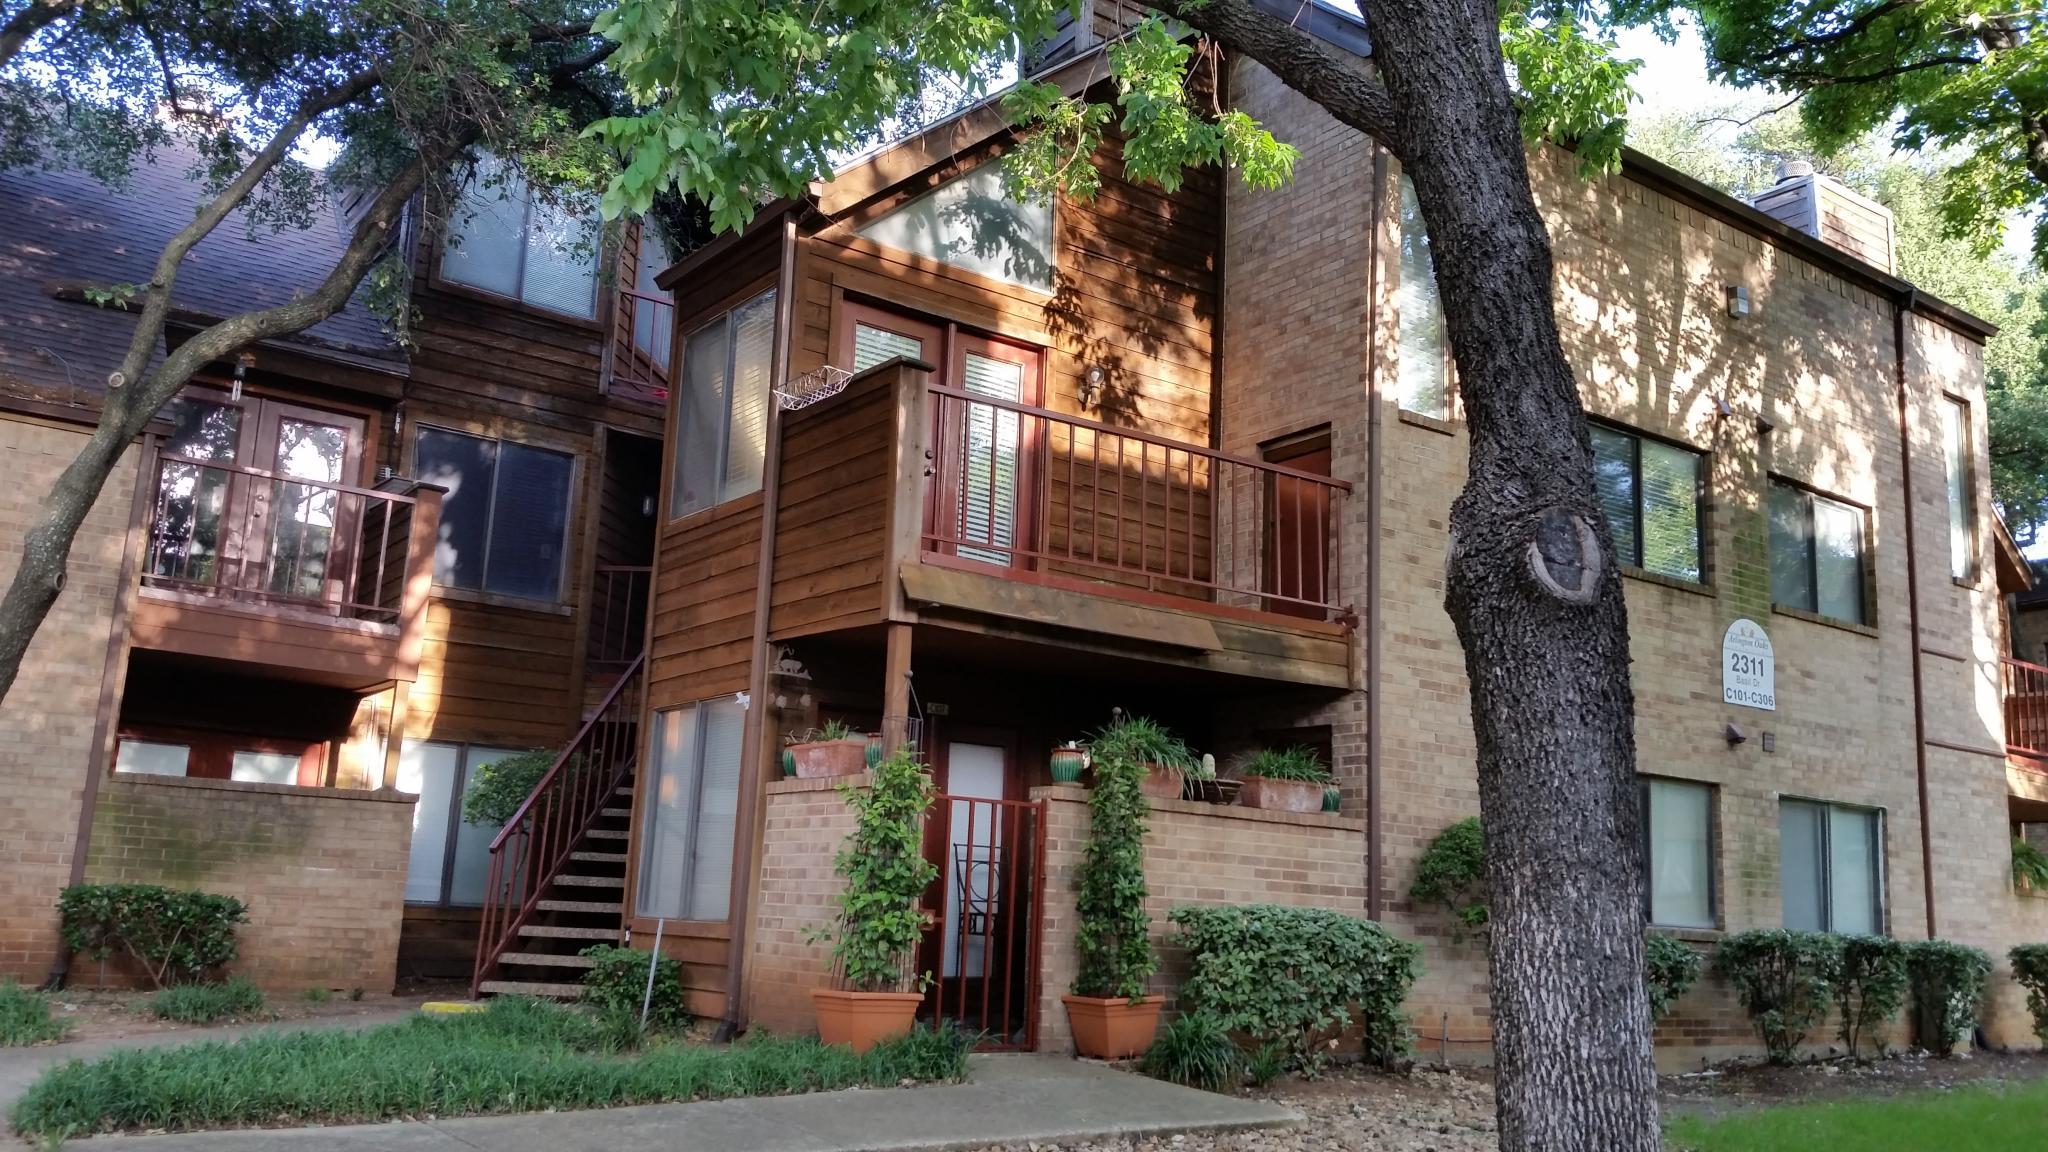 oaks bedroom inc watch bardin tx youtube lumacorp arlington apartments